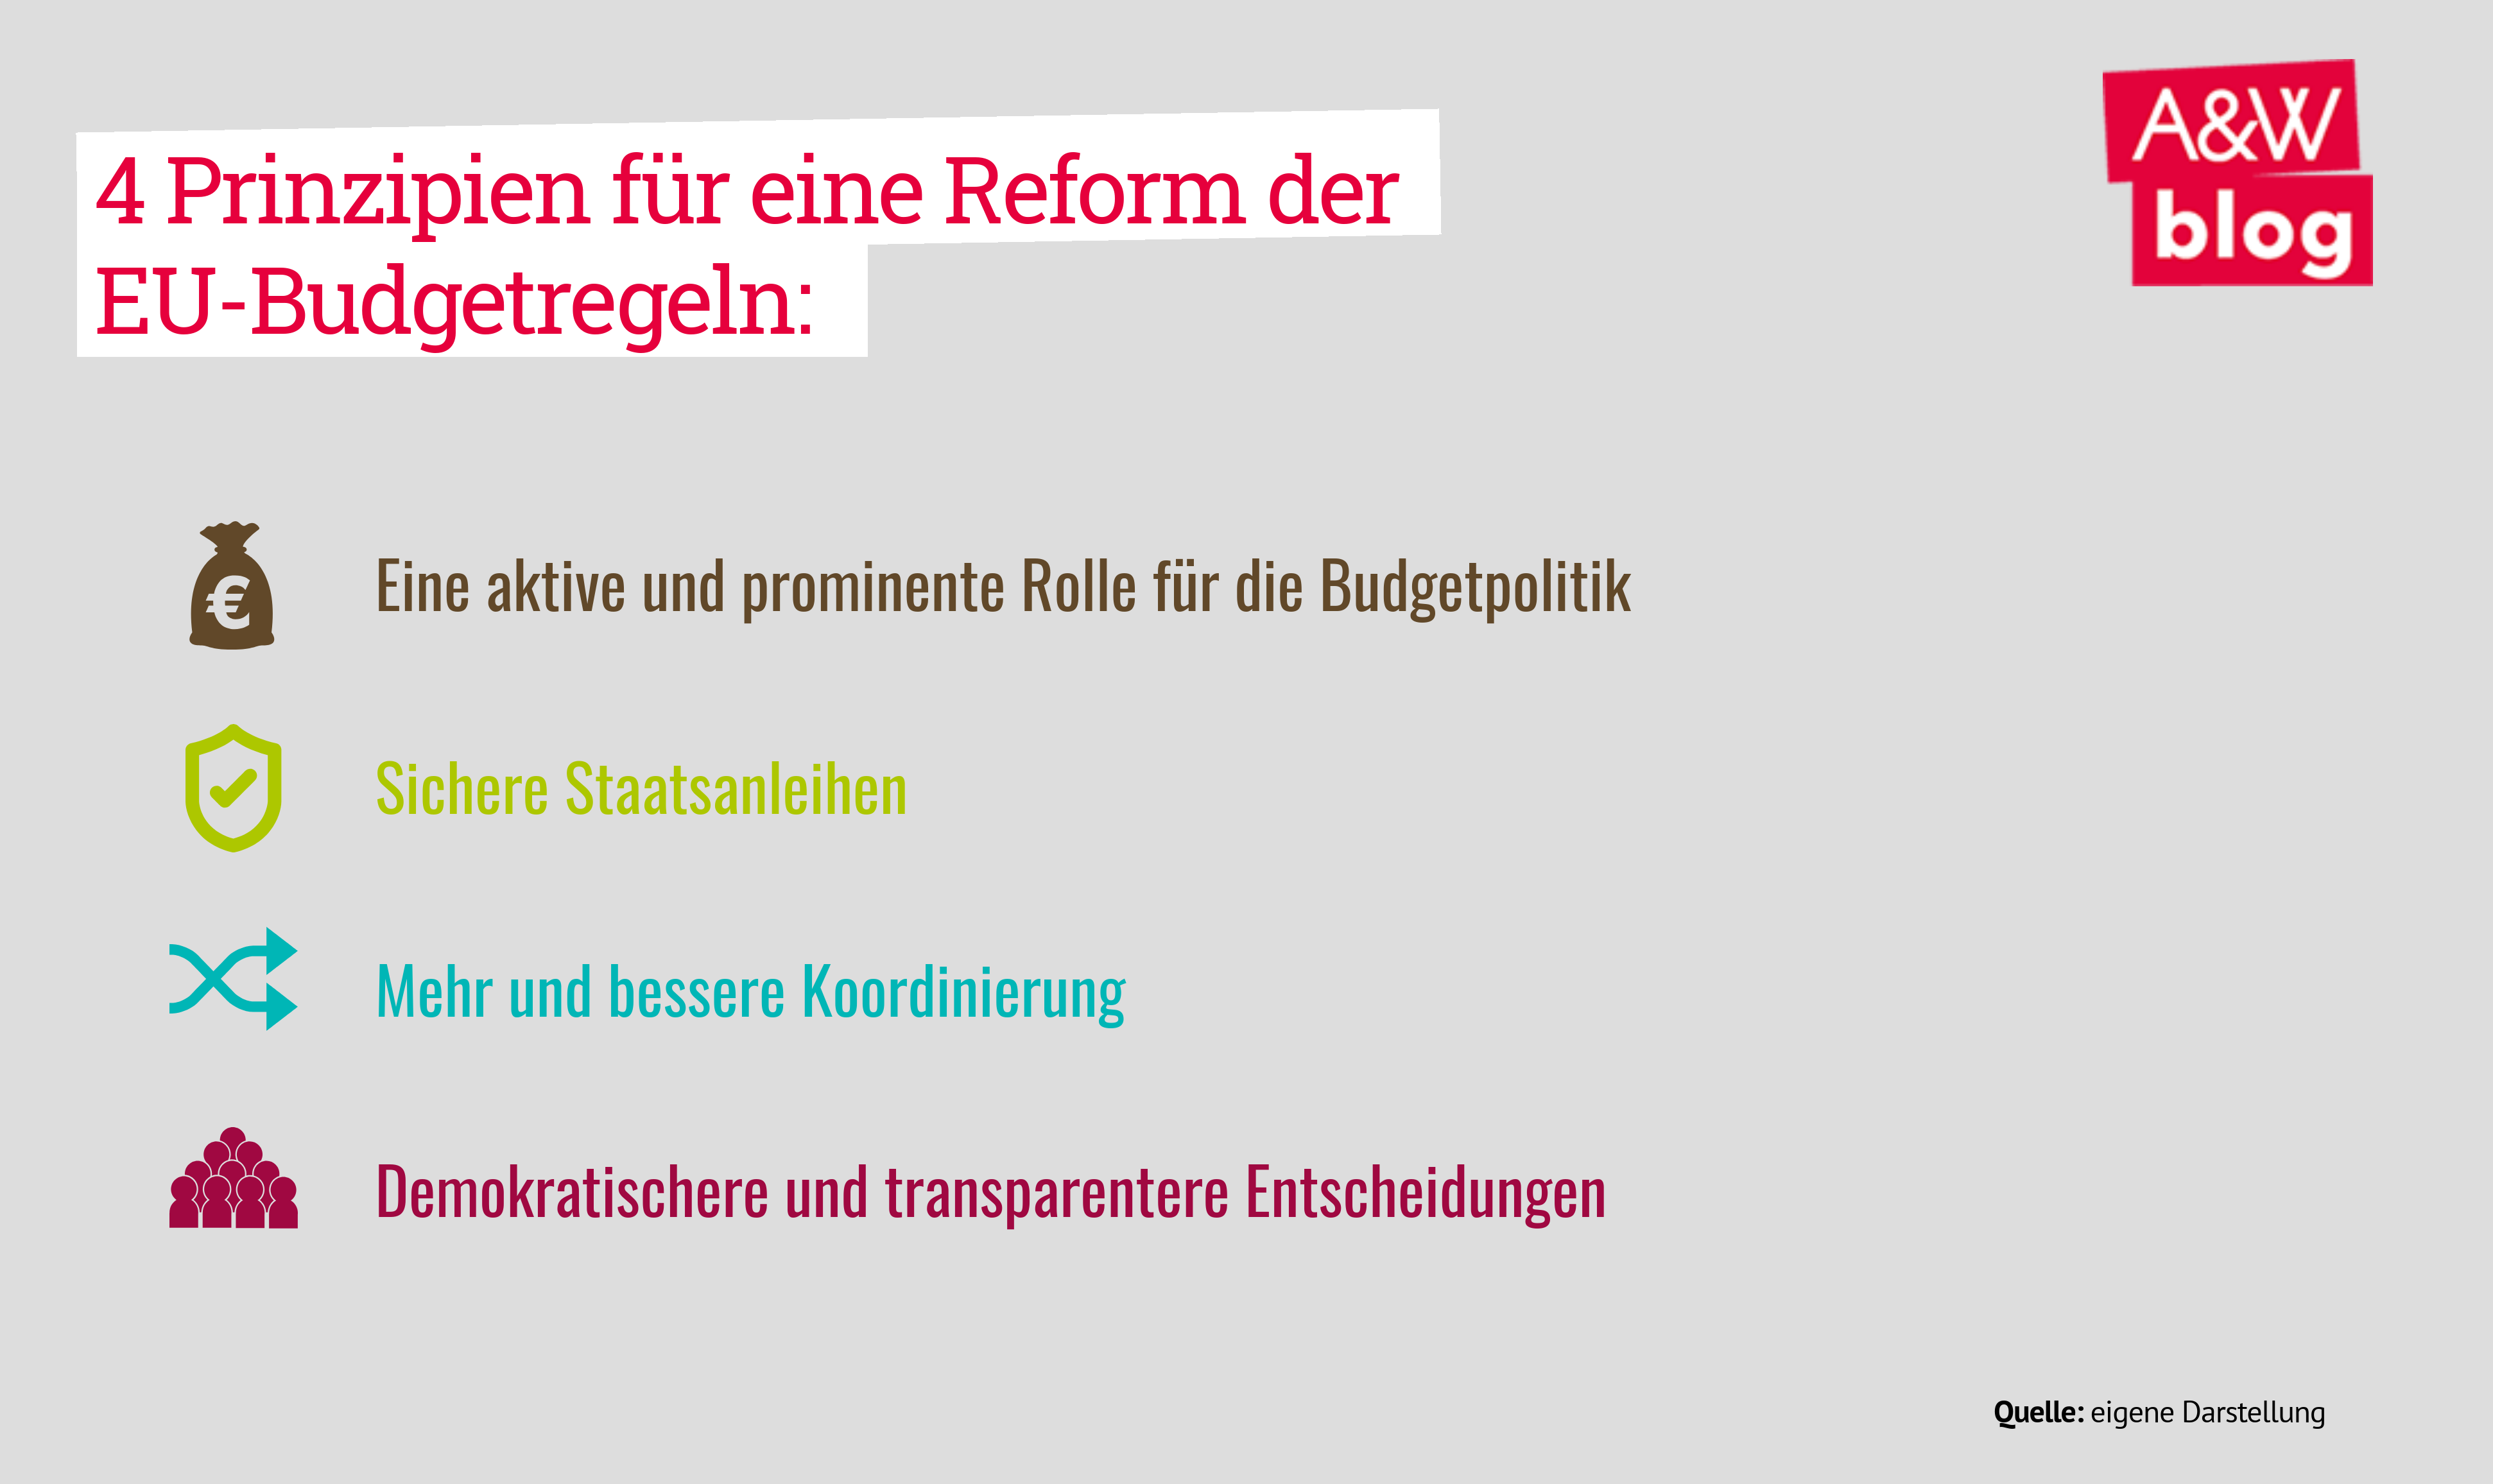 EU-Budgetregeln